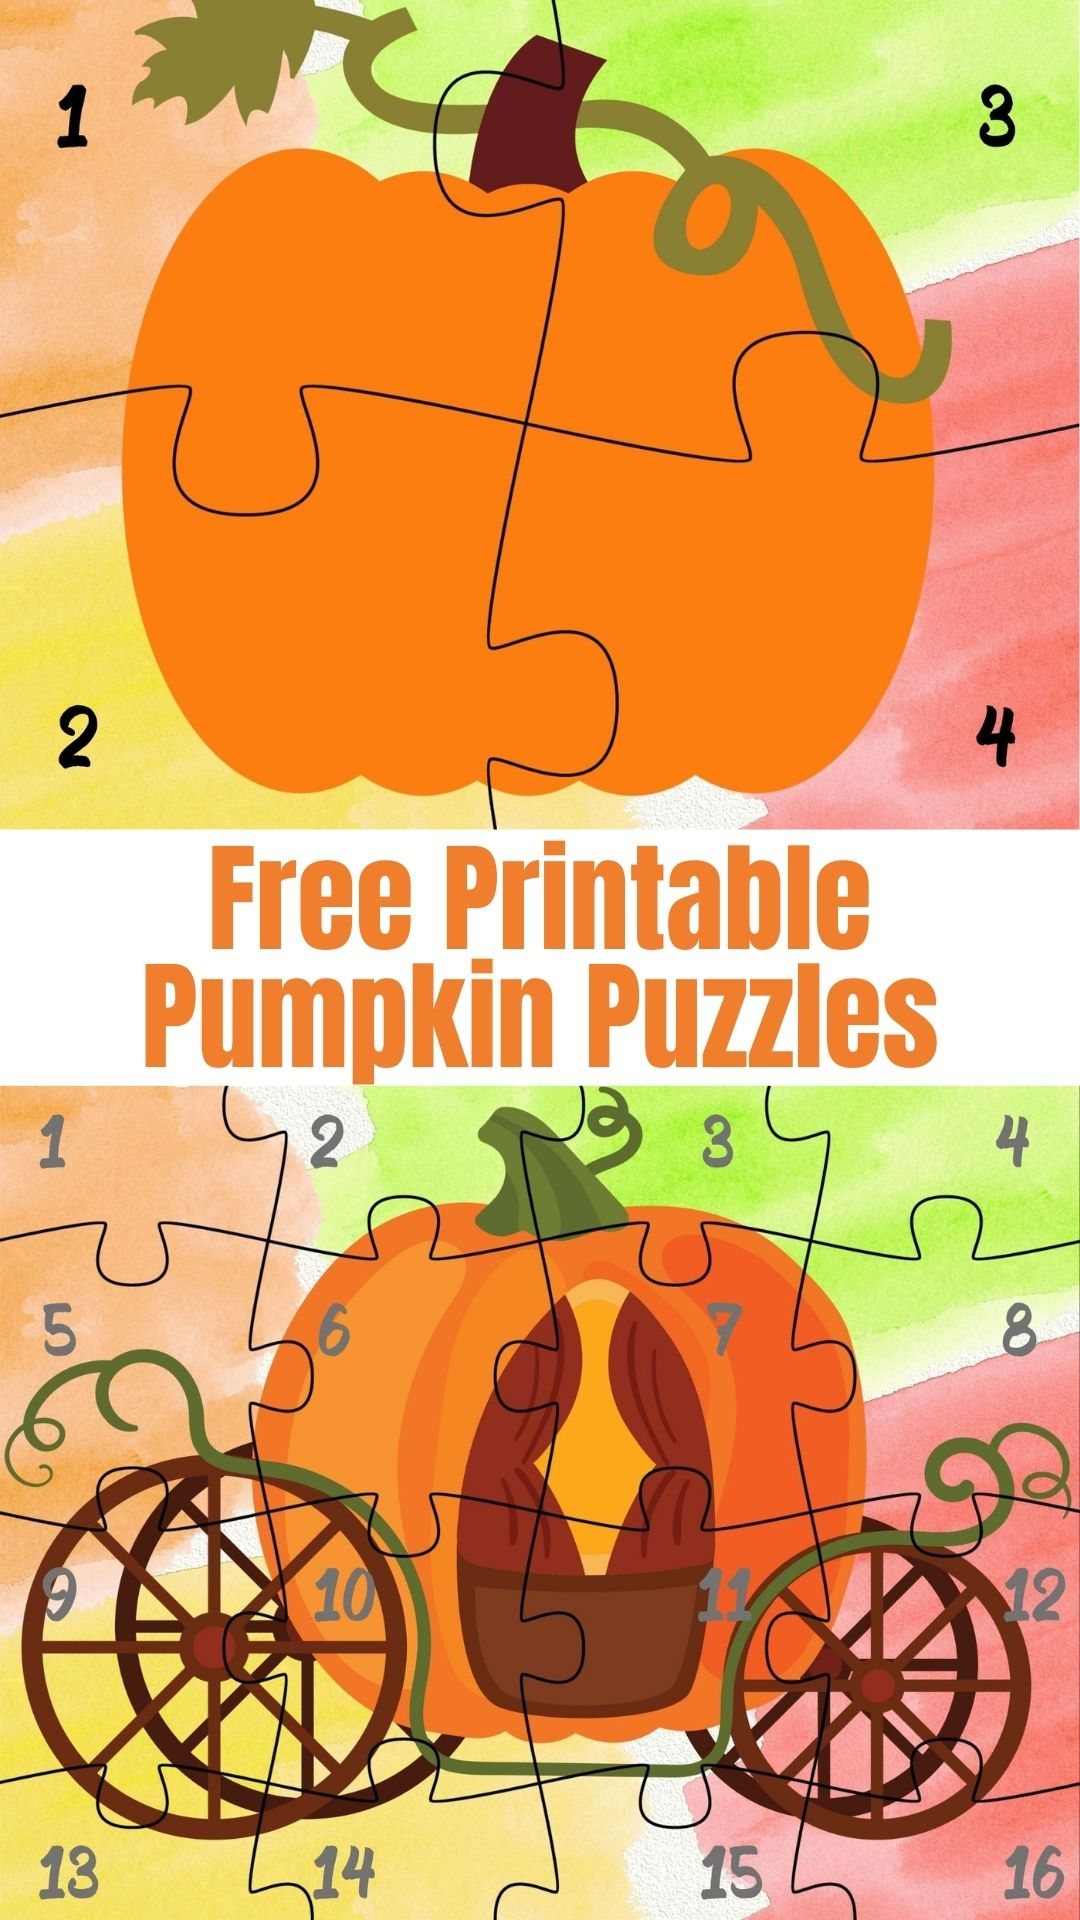 Free Printable Pumpkin Puzzles for Preschoolers